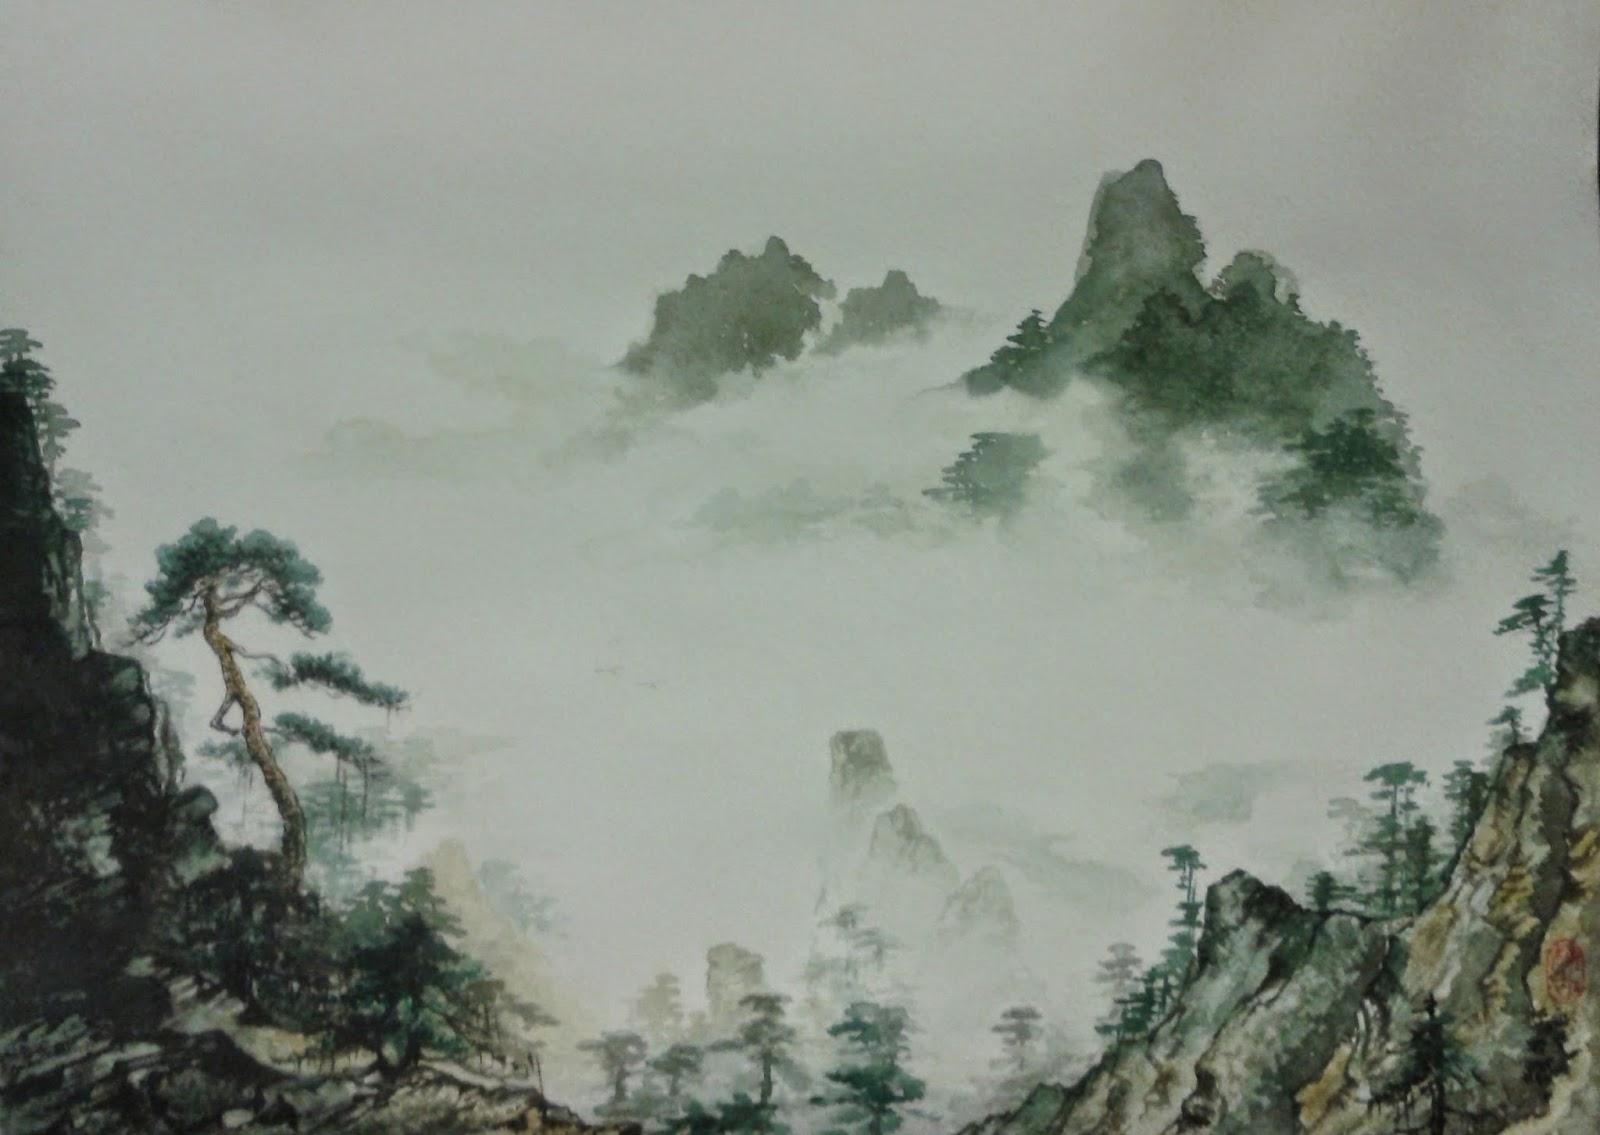 Китайская живопись гохуа от shigu: shigu-gohua.blogspot.com/2014/05/chinese-painting-gohua-landscapes...